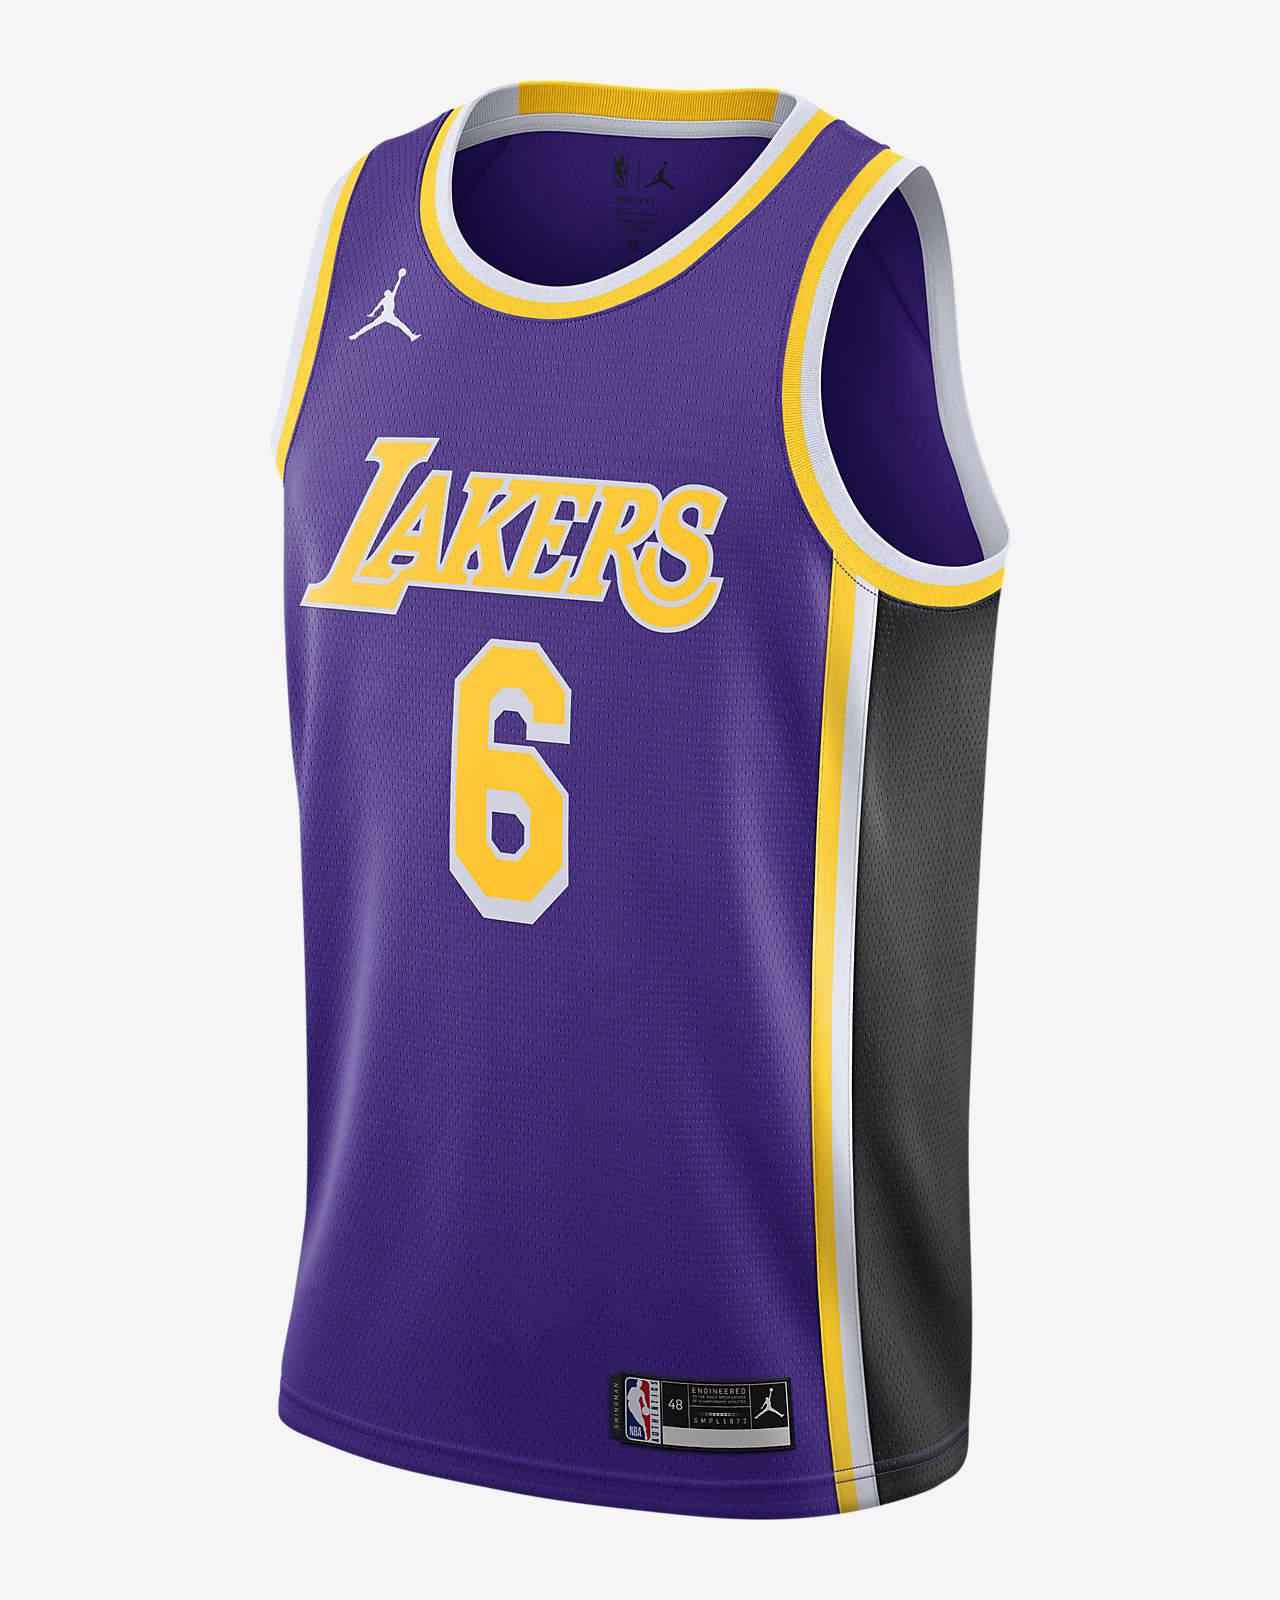 Los Angeles Lakers Statement Edition 2020 Camiseta Swingman Jordan de la NBA